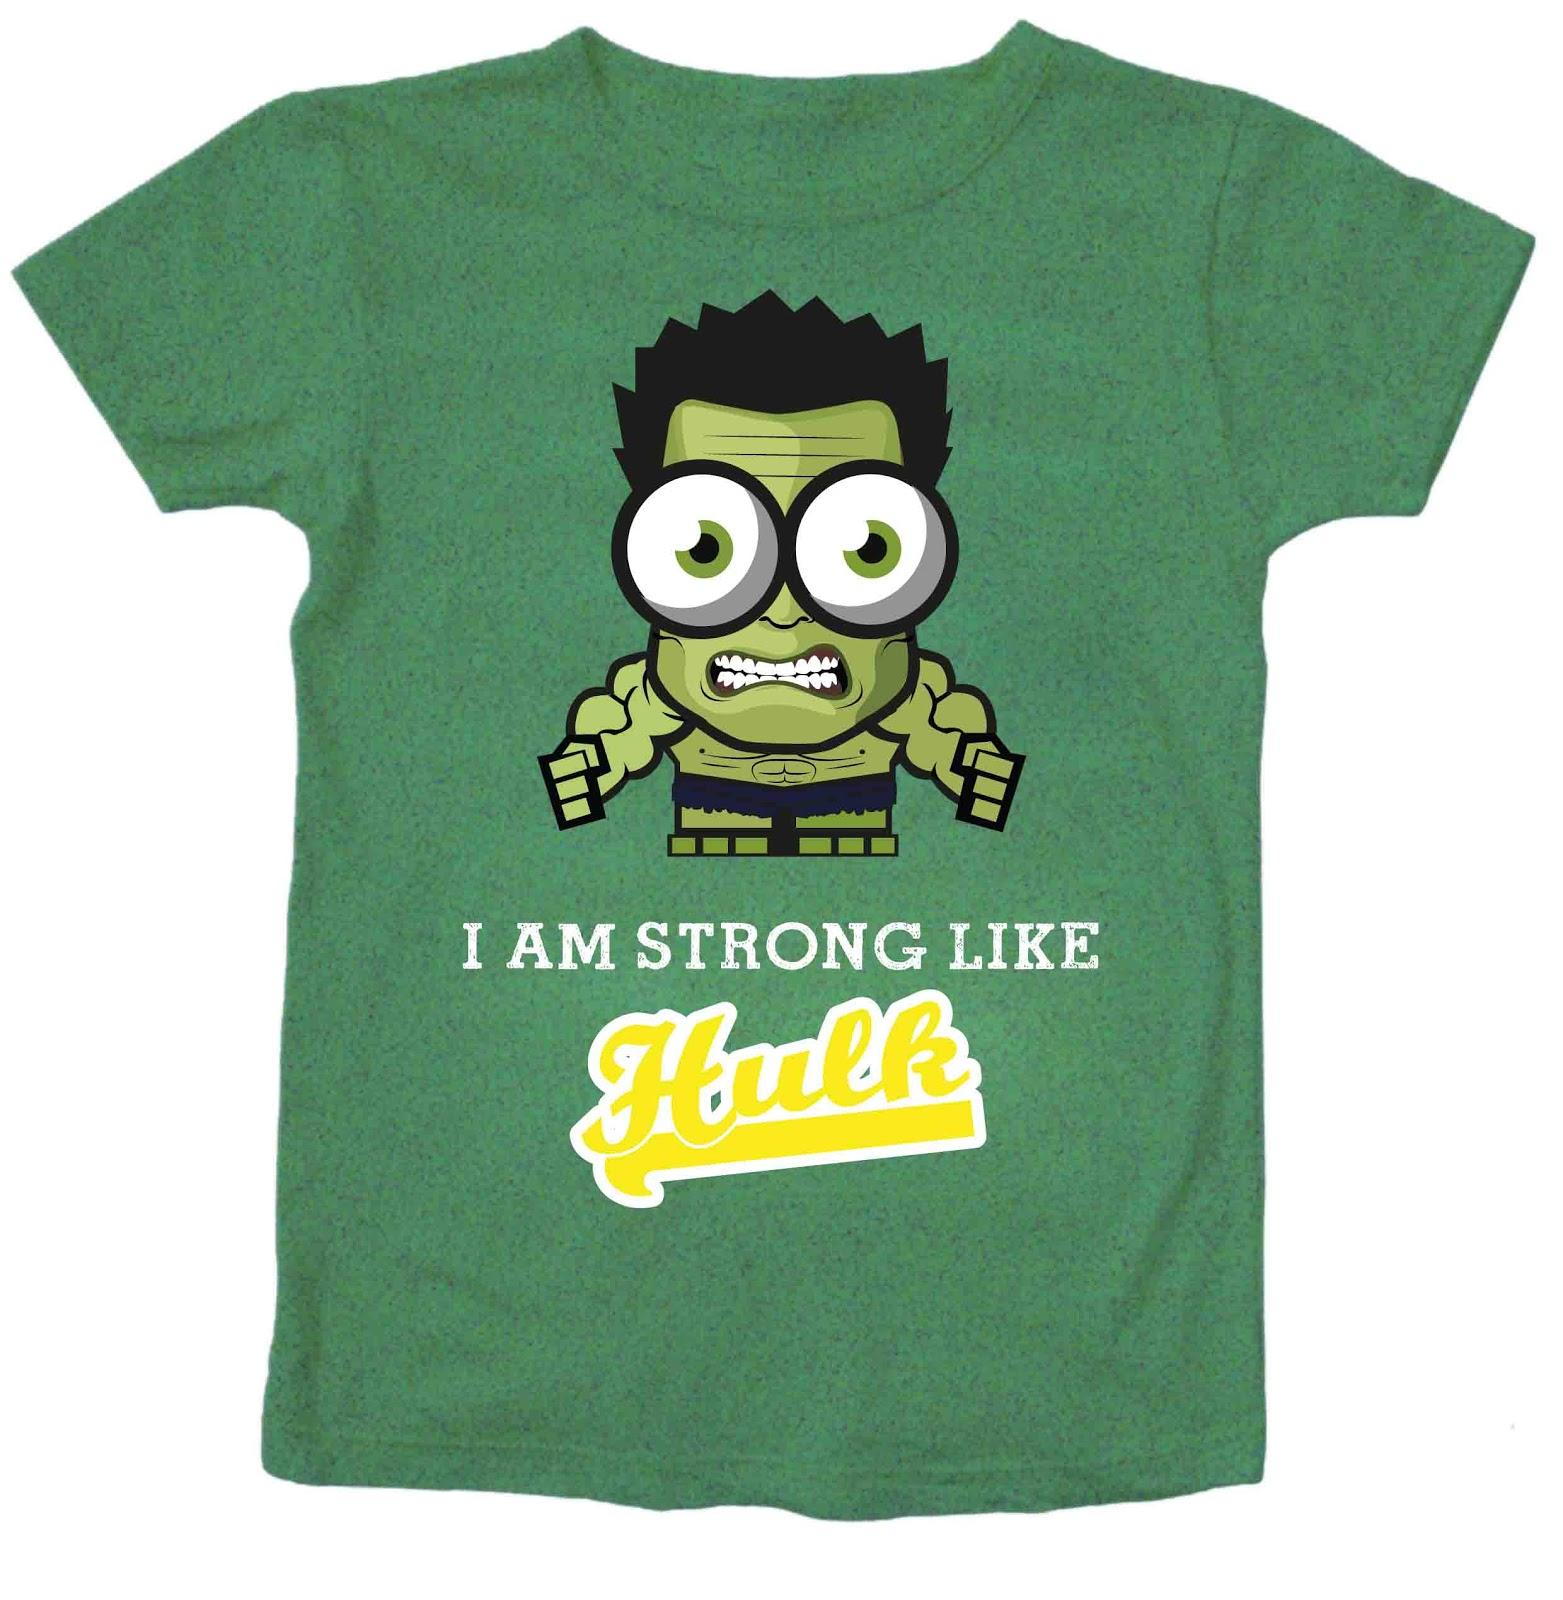 Baju Superhero Hulk Yang Lucu Dan Unik Wonder Kidz